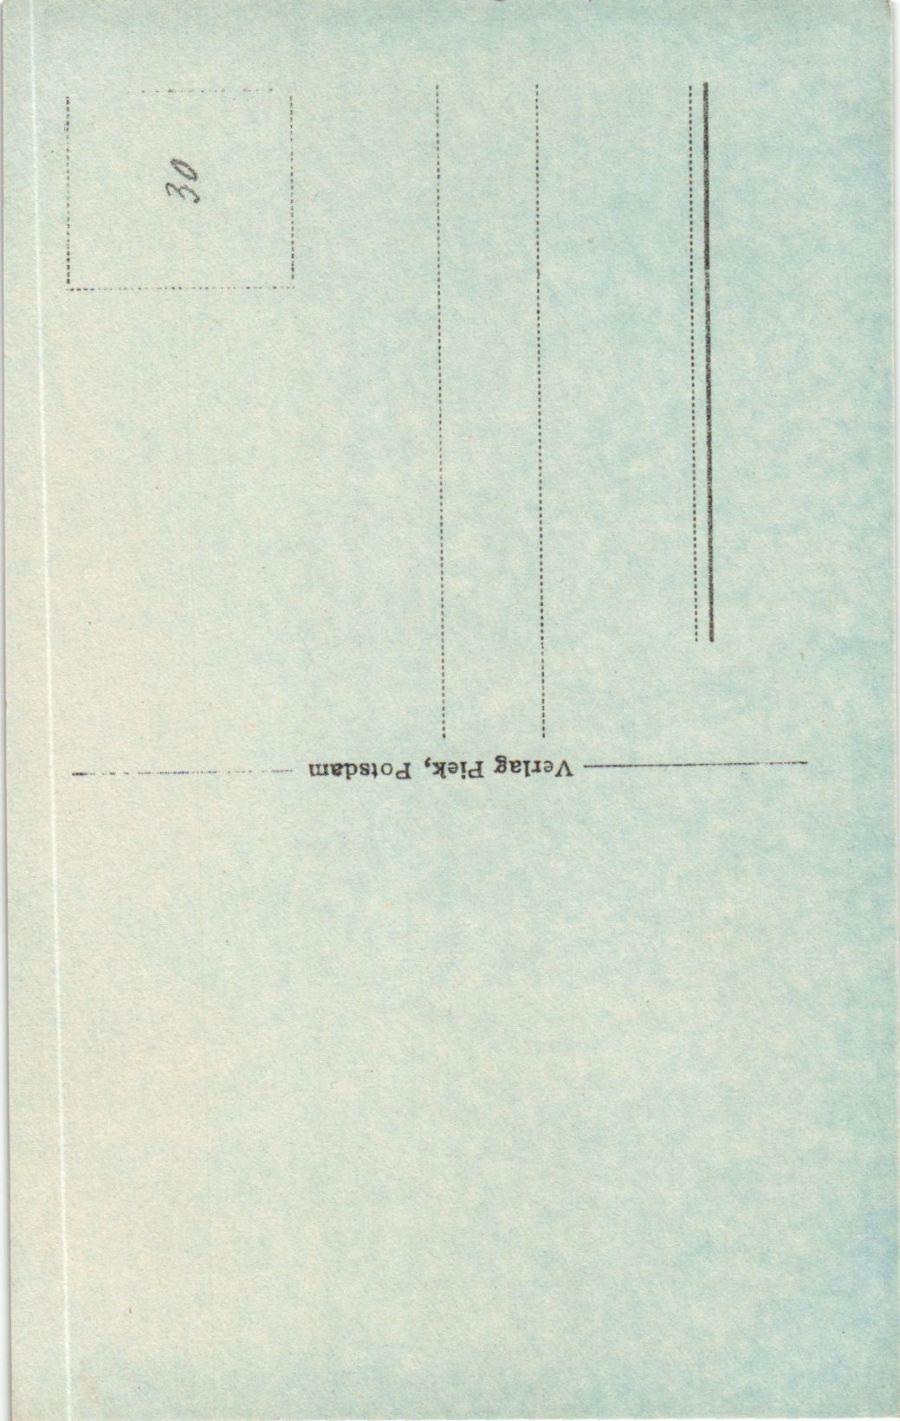 CPA-AK-Kronprinzessin-Cecilie-Alexandrine-Cecilie-GERMAN-ROYALTY-867432 Indexbild 2